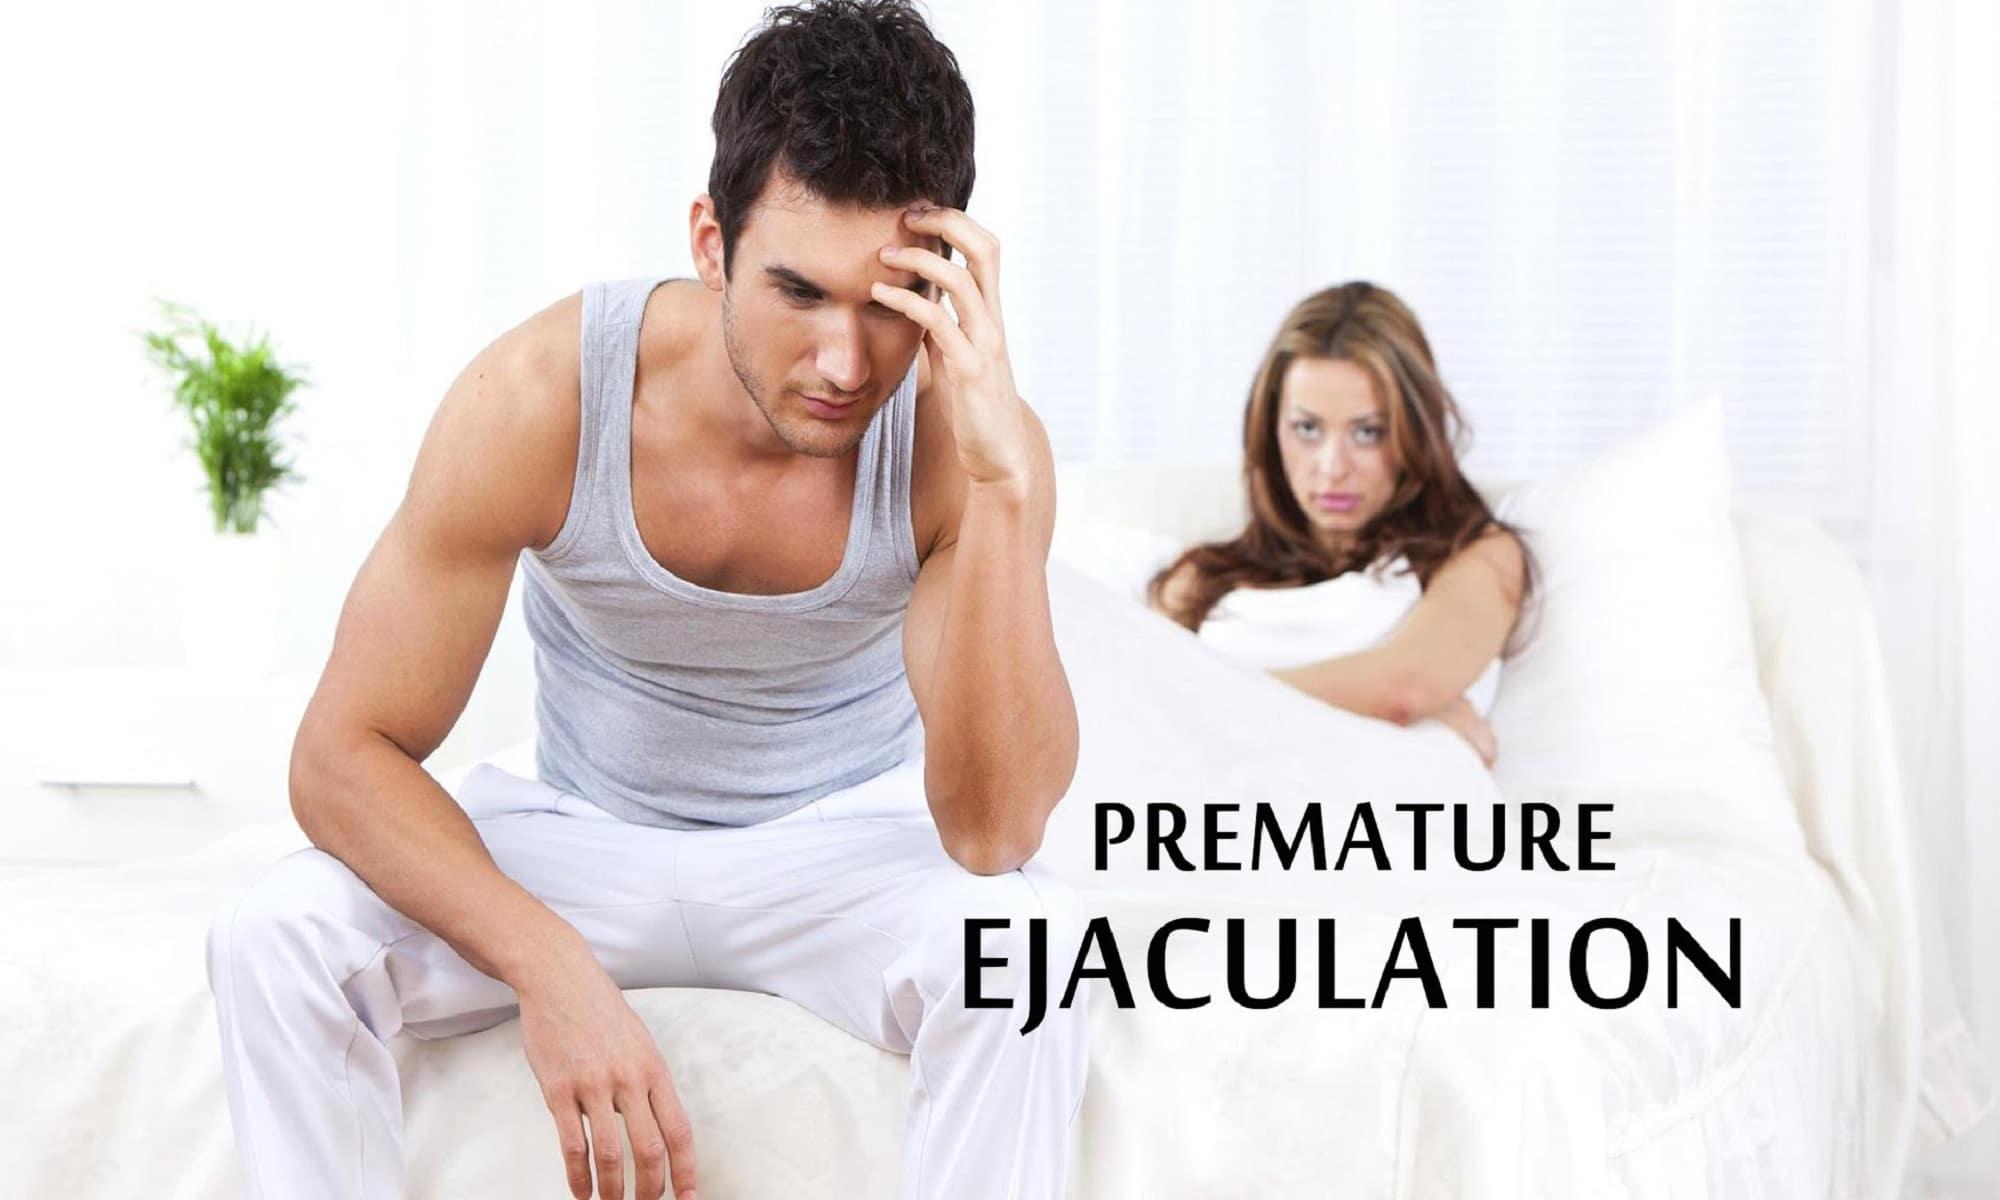 Mental techniques for premature ejaculation